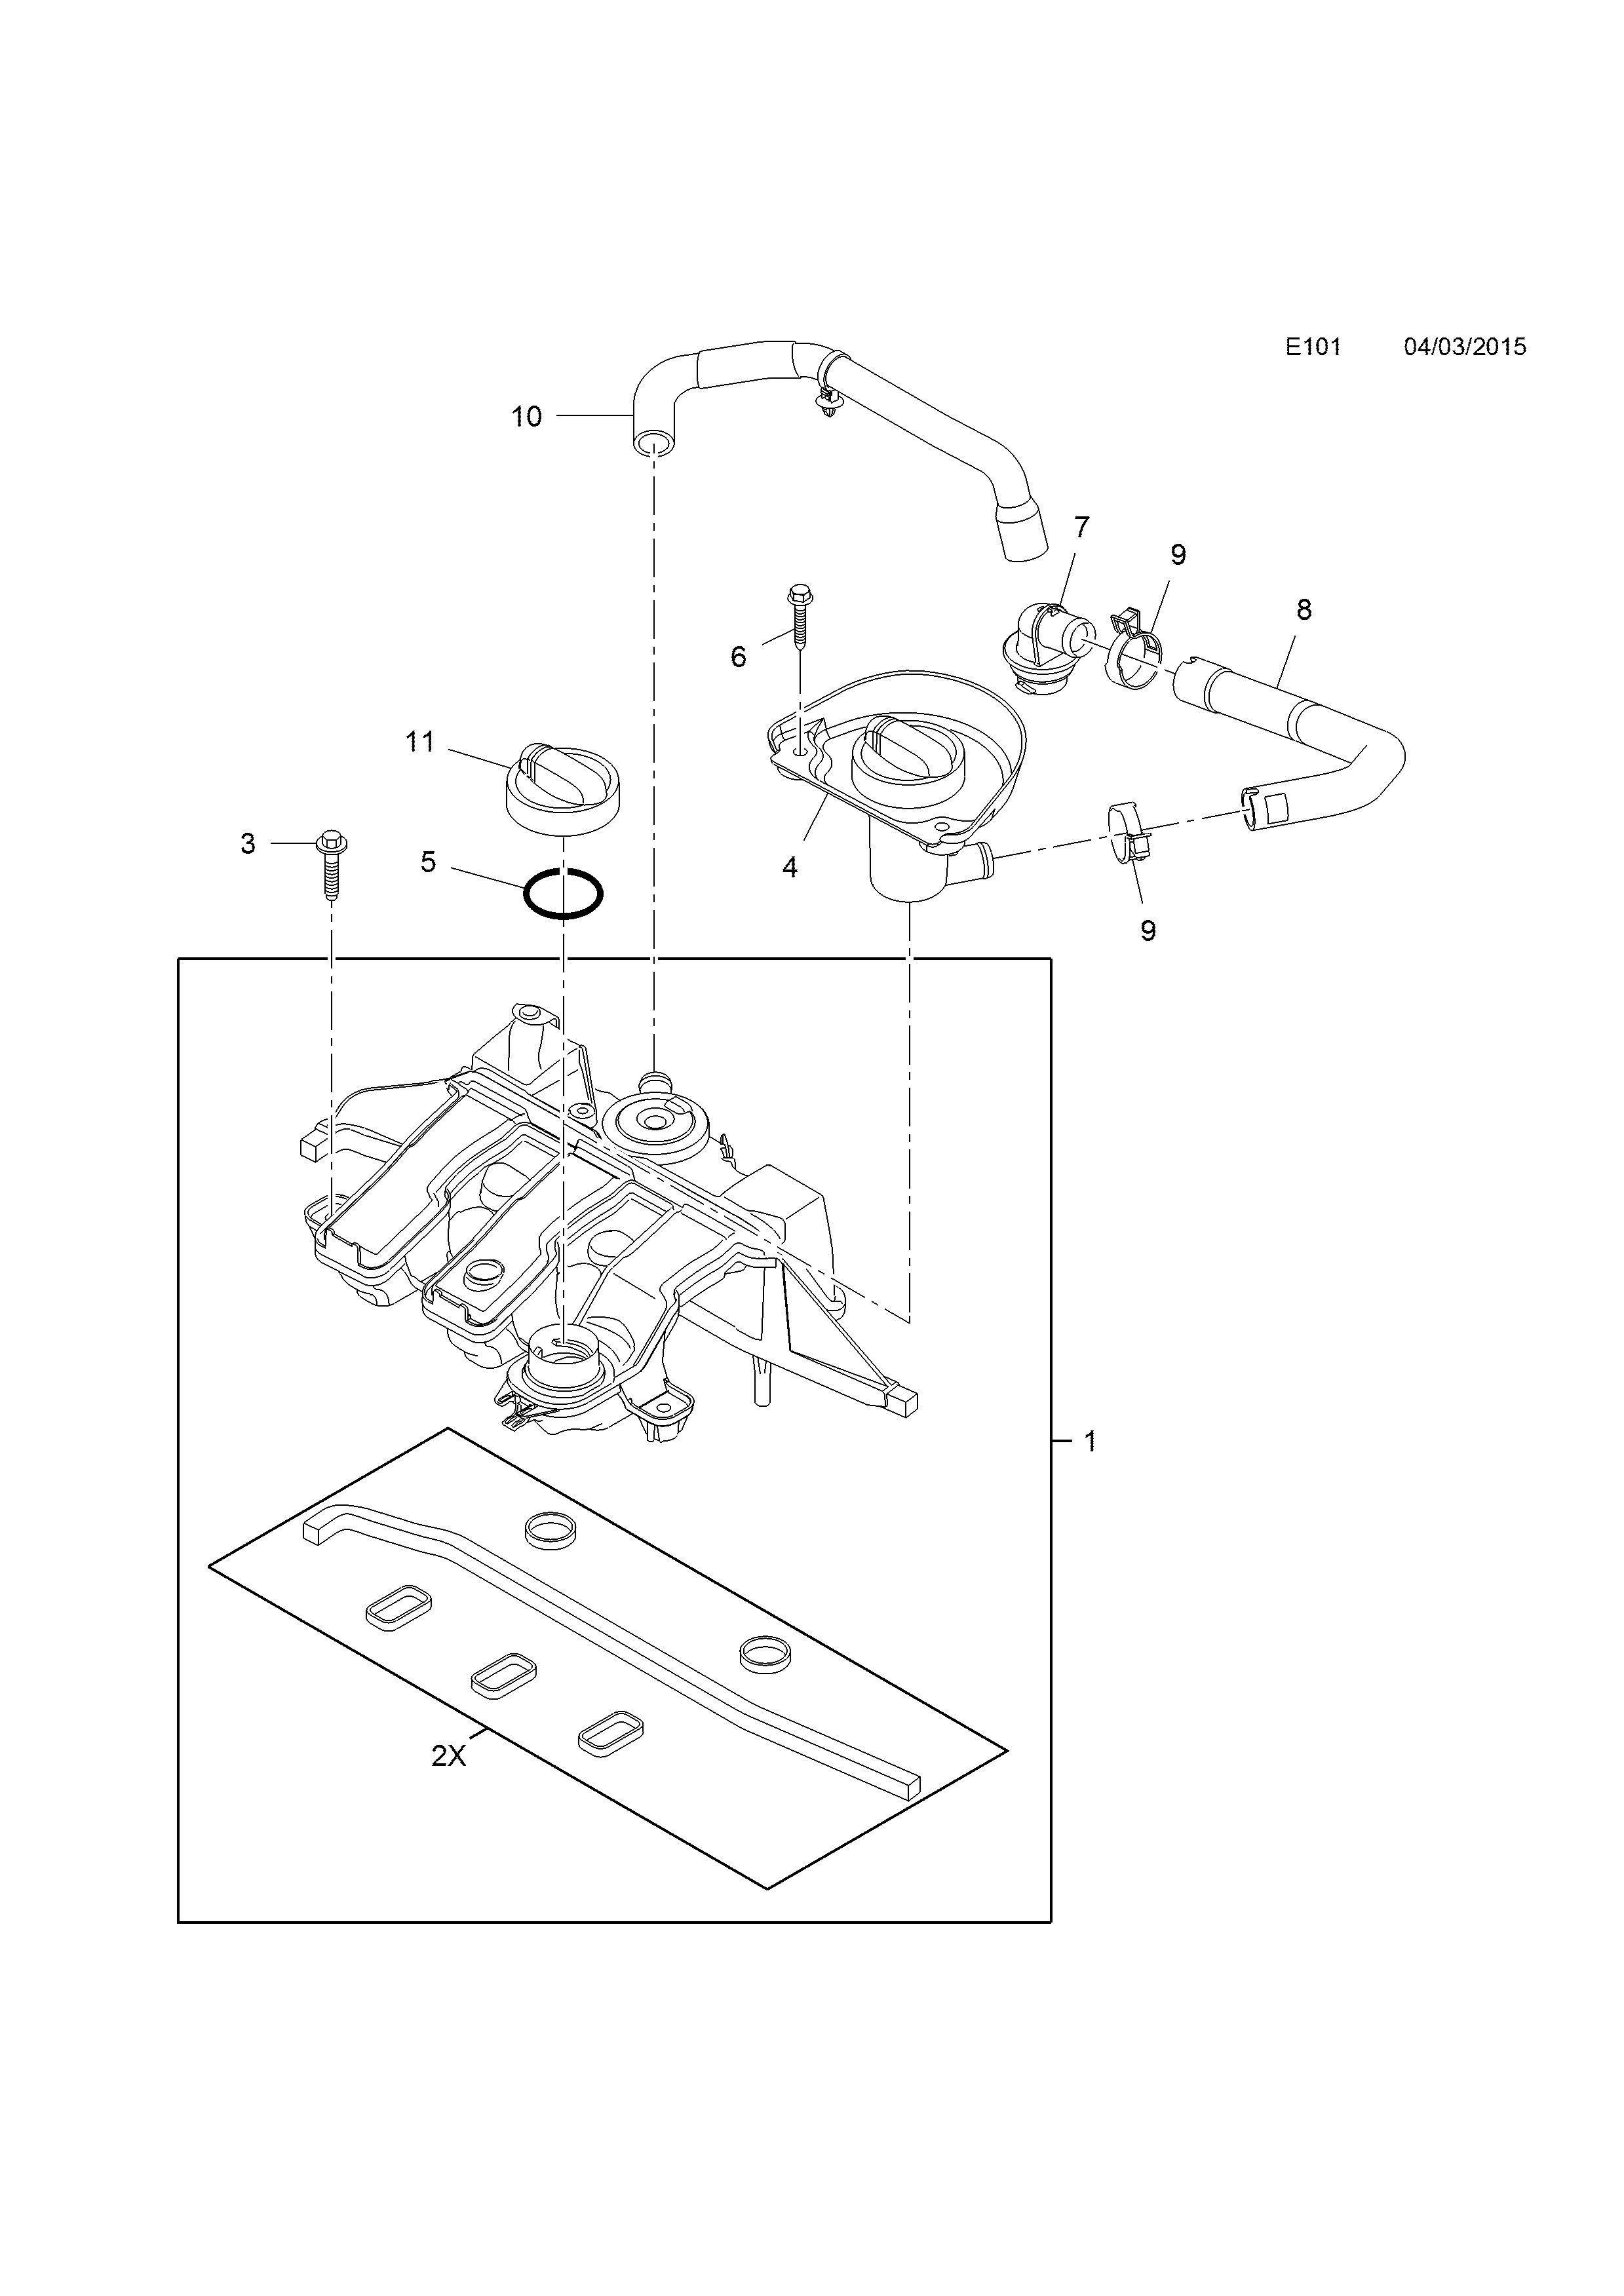 Opel Vivaro B 2015 E Engine And Clutch 1 16d R9m Mambmc Mb Diagram List Of Parts